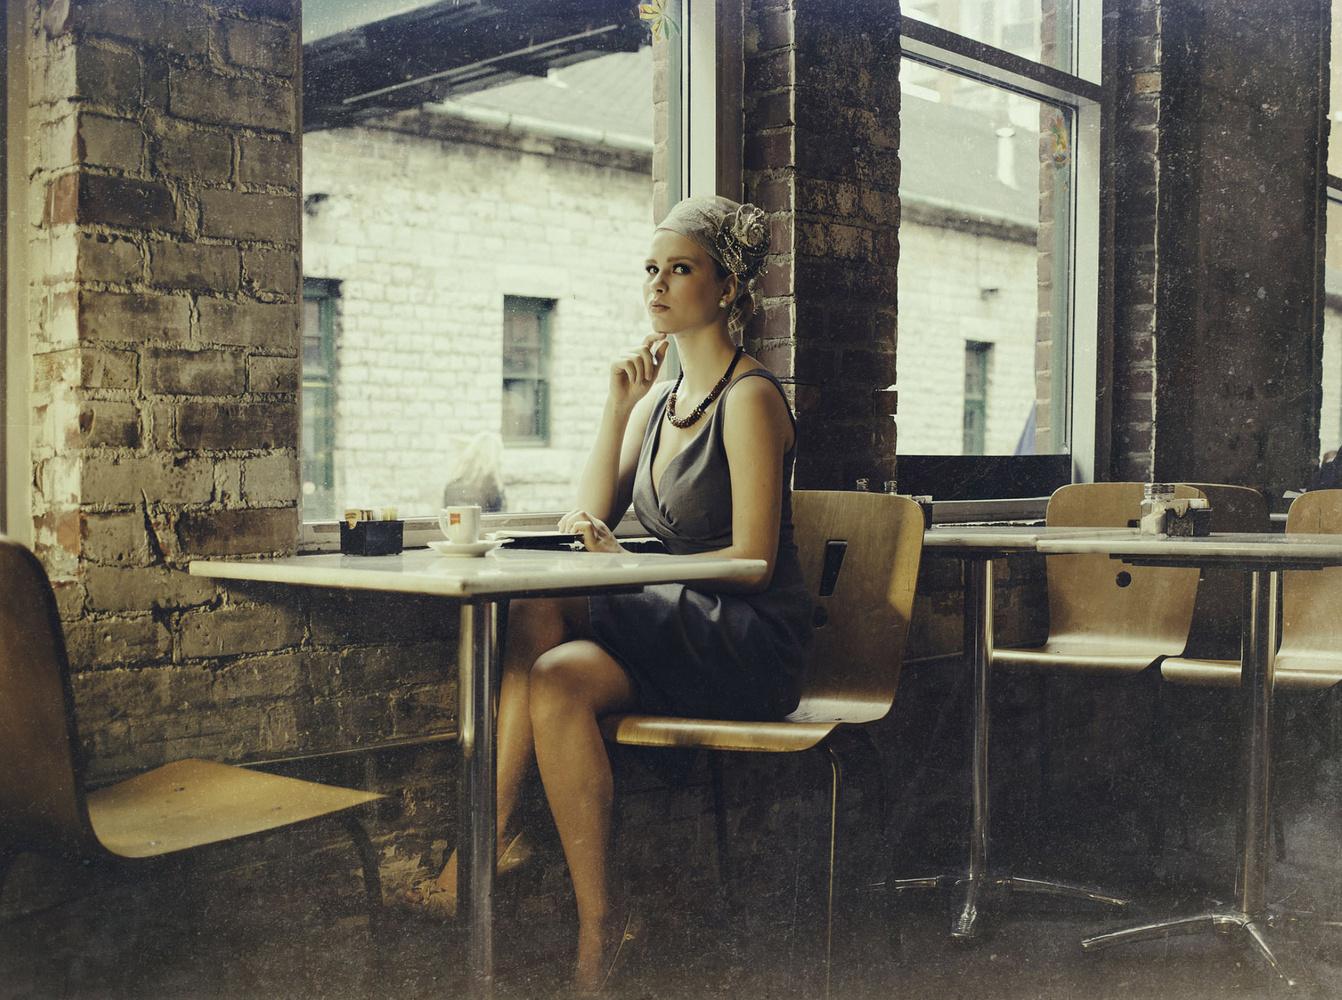 Le Café by Ian Pettigrew